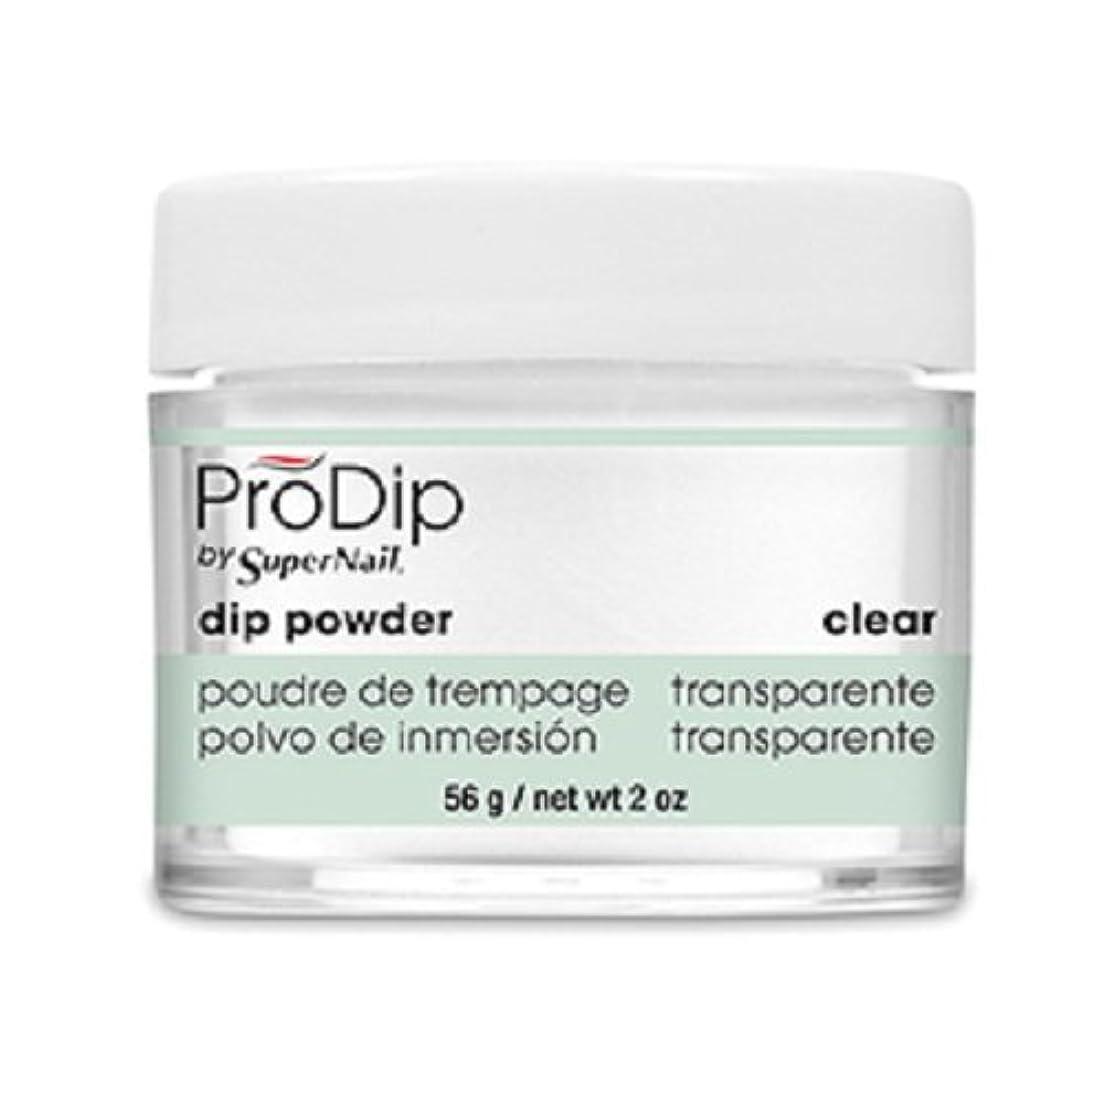 SuperNail - ProDip - Dip Powder - Clear - 56 g/2 oz